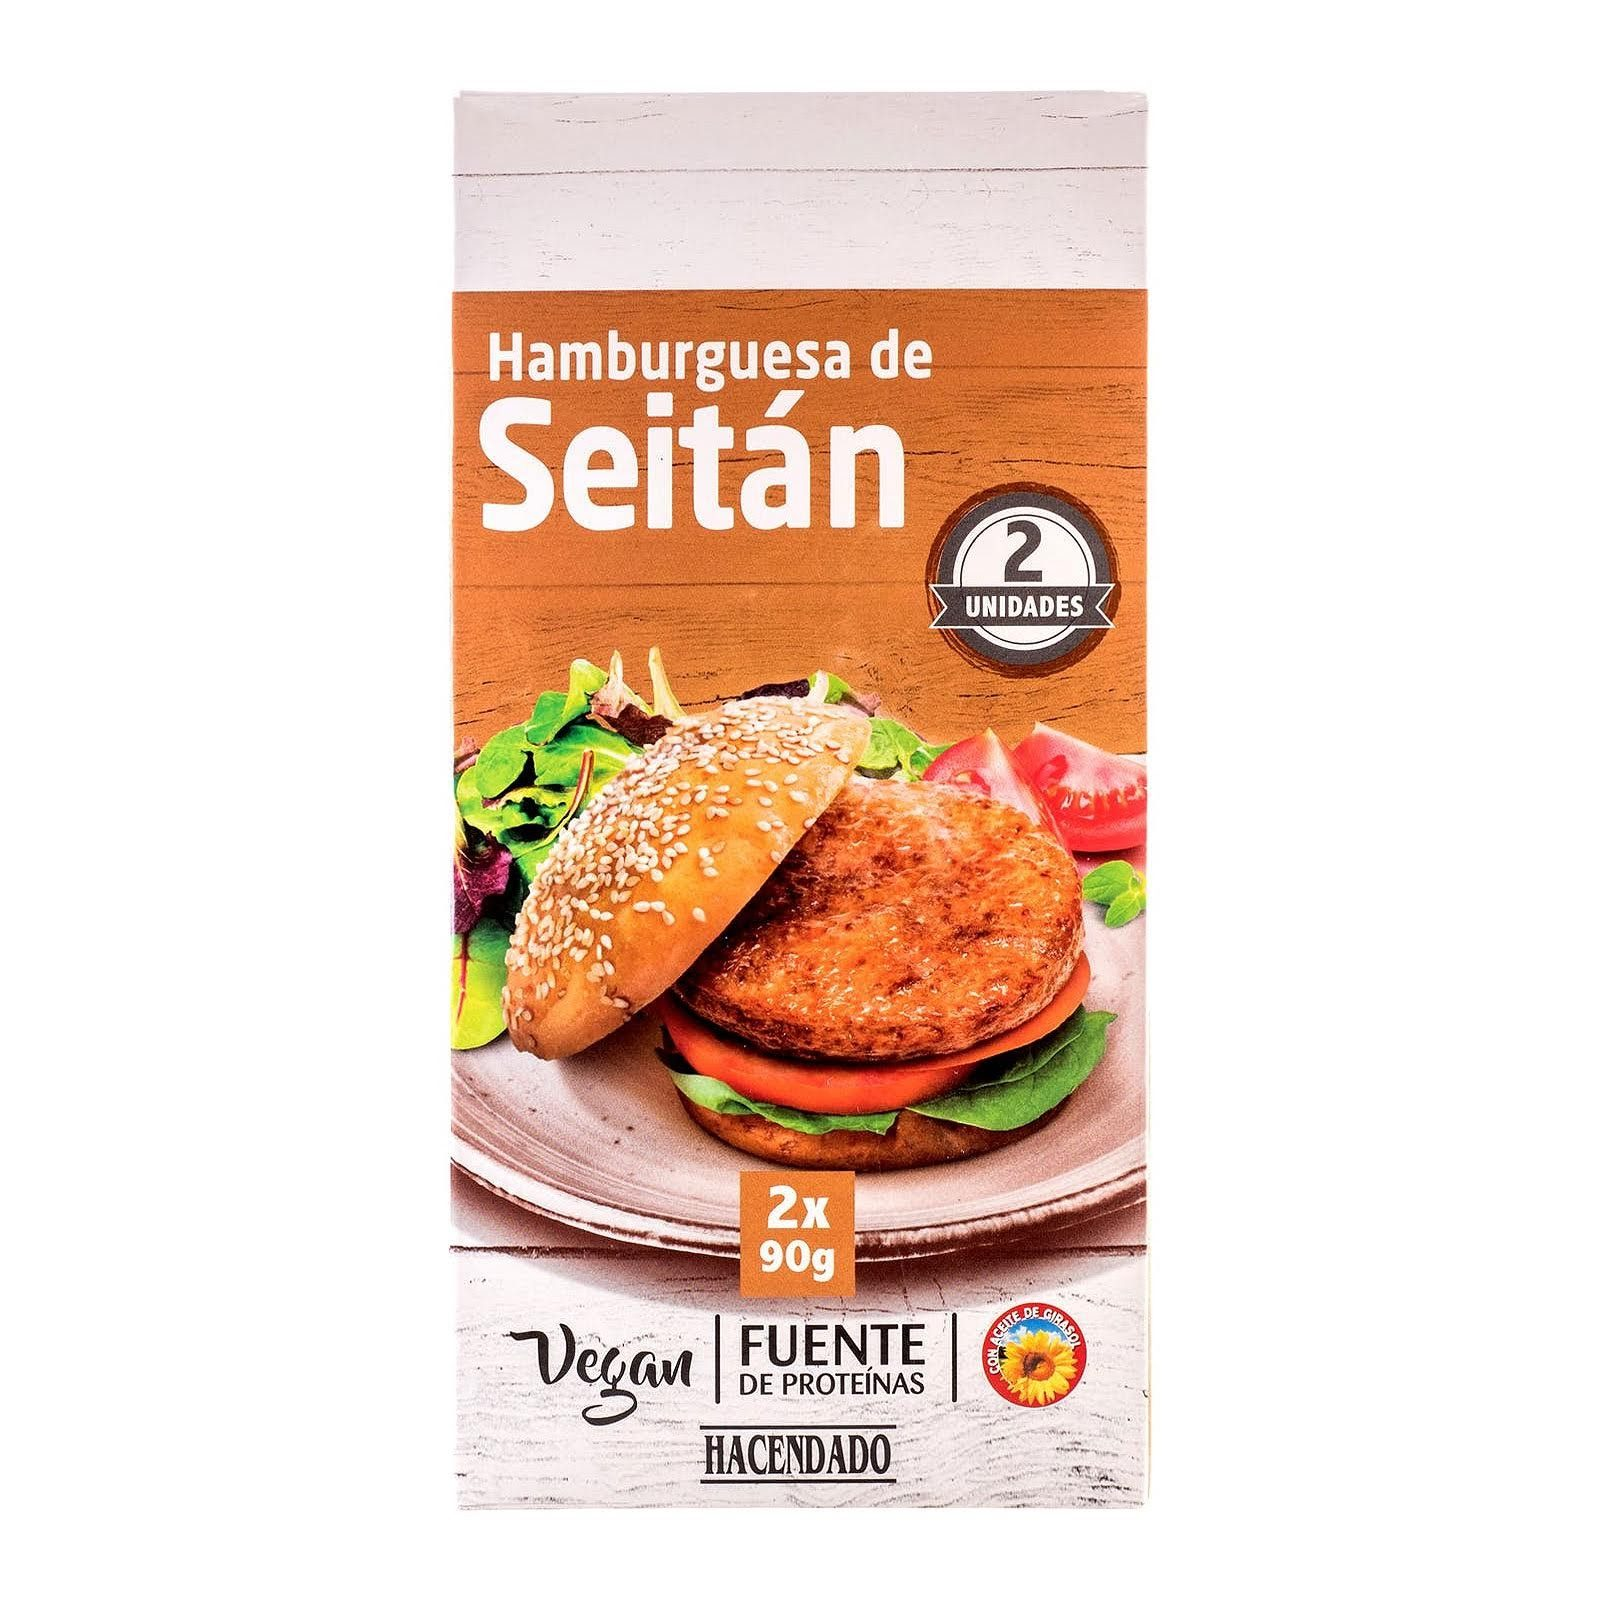 hamburguesa-de-seitan-hacendado-mercadona-1-6647622